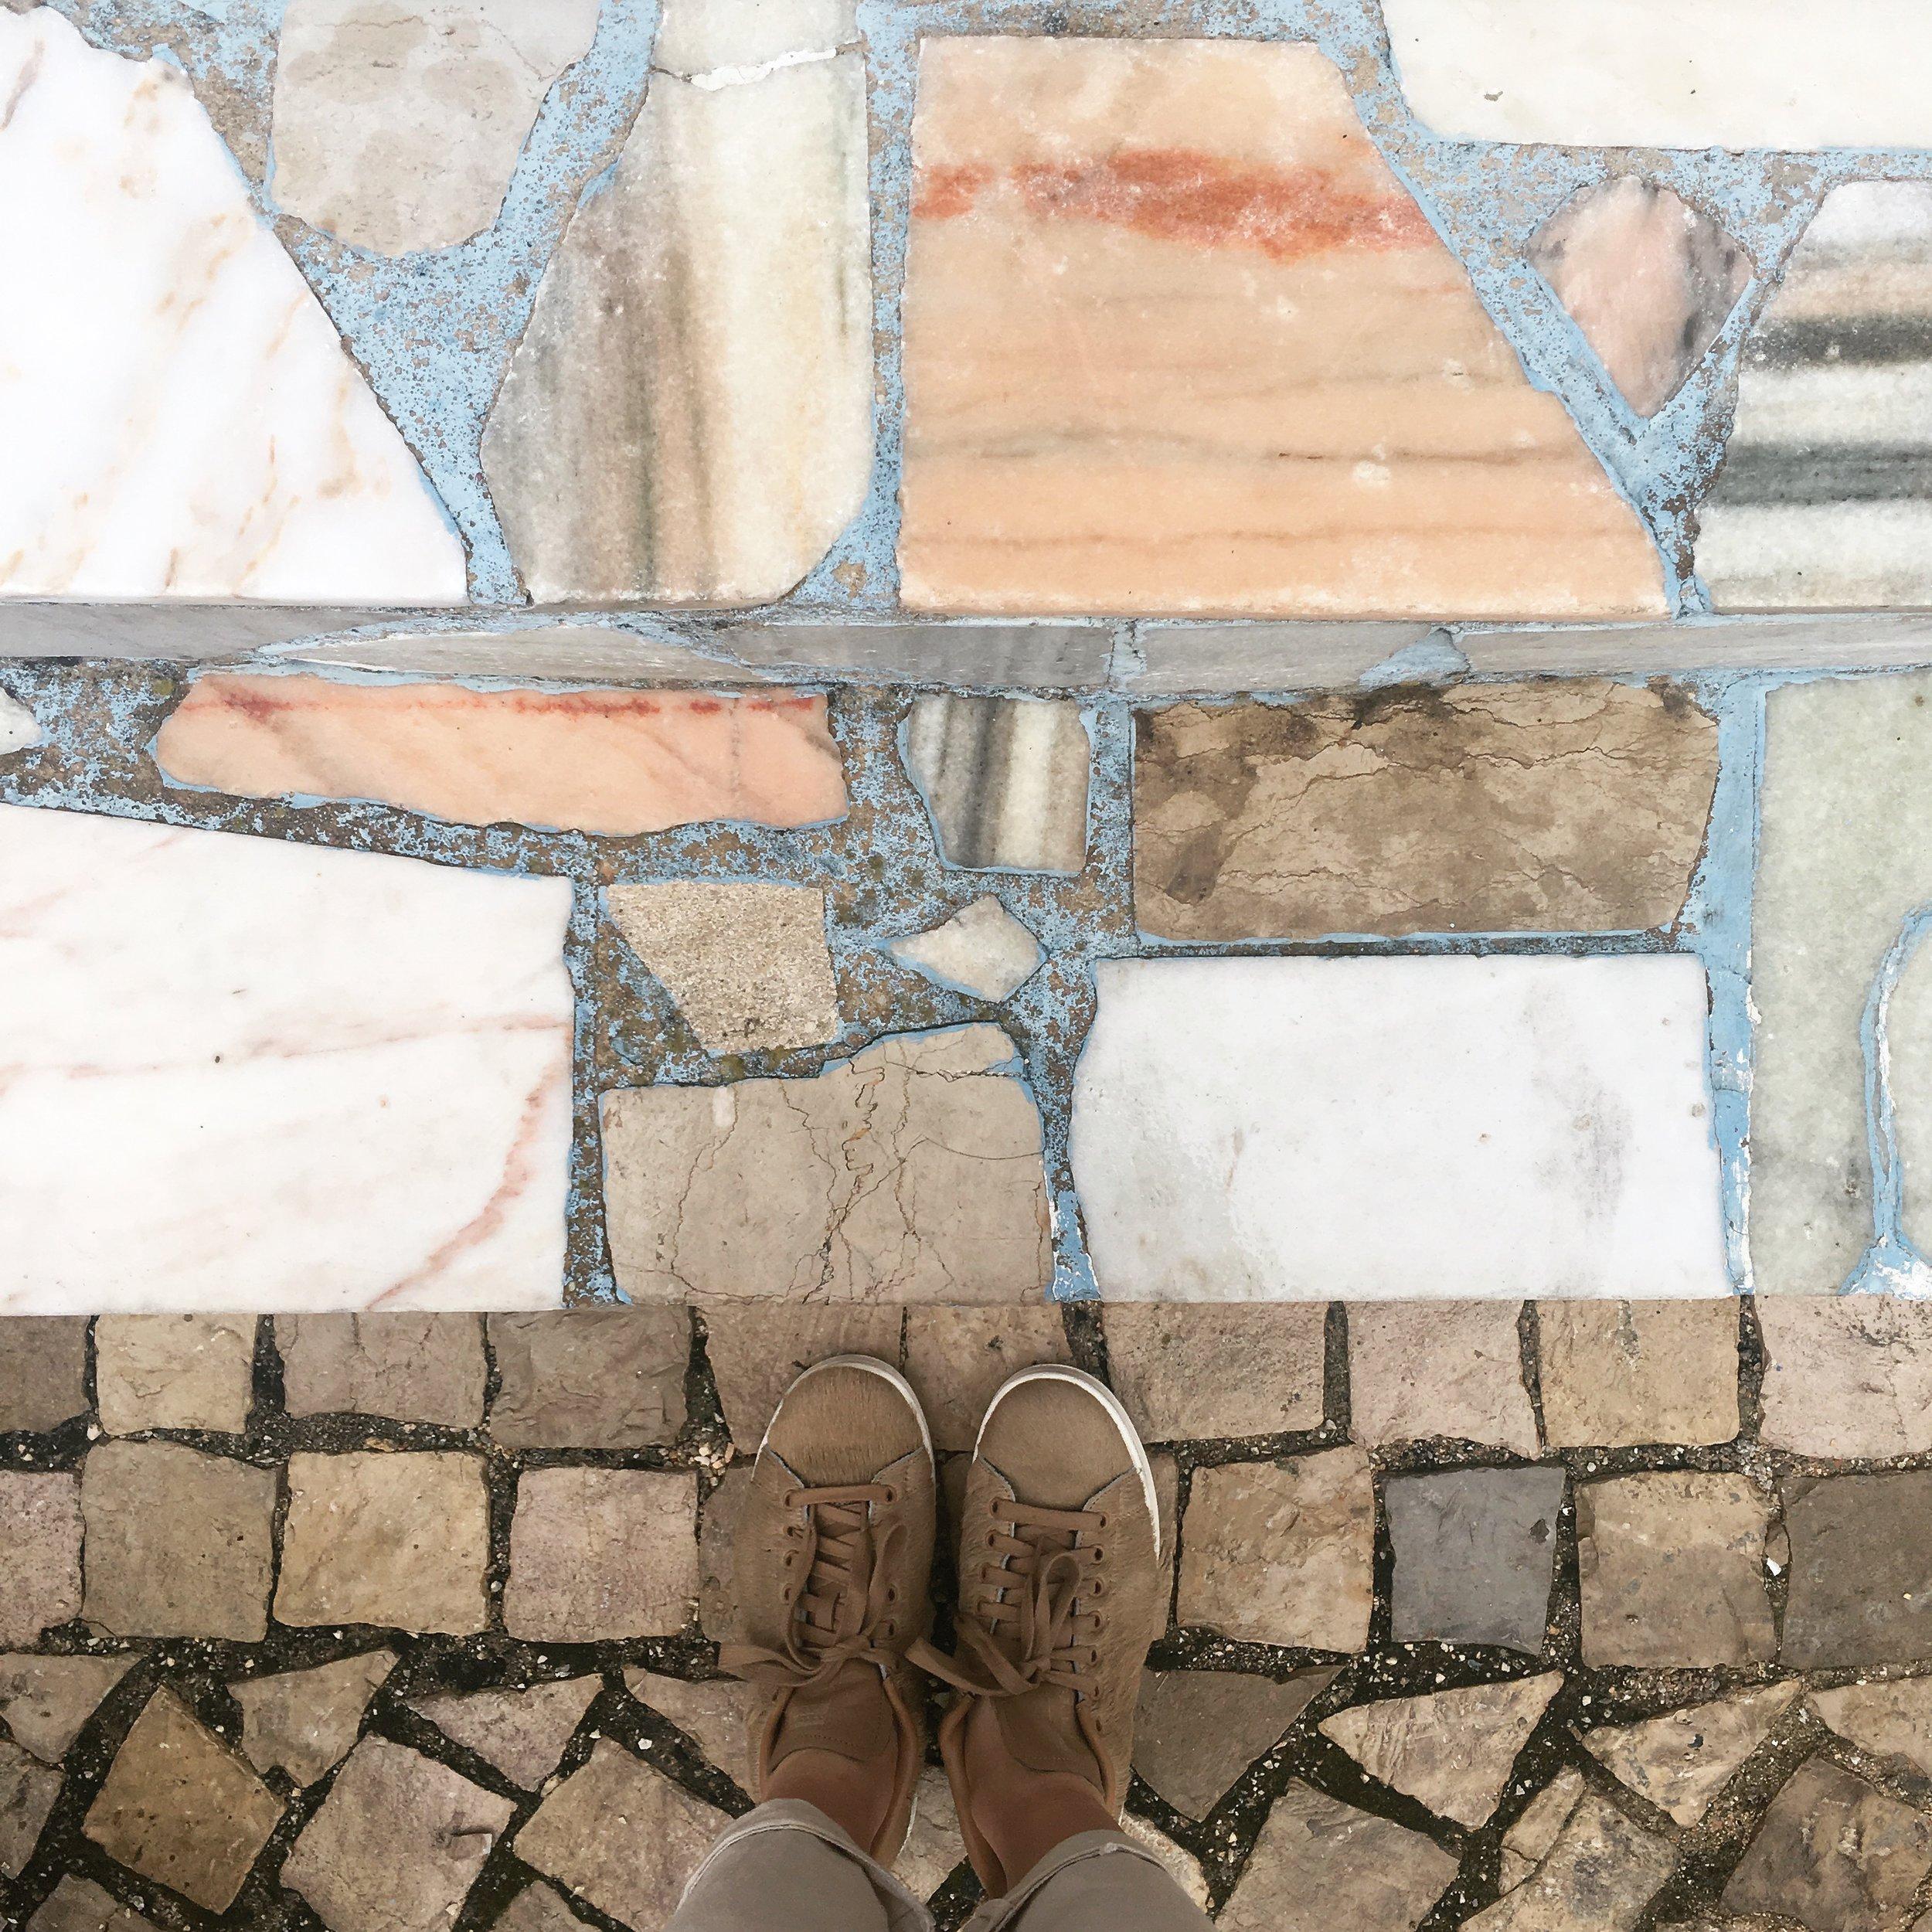 Lozidaze_Lagos-Flooroy_01